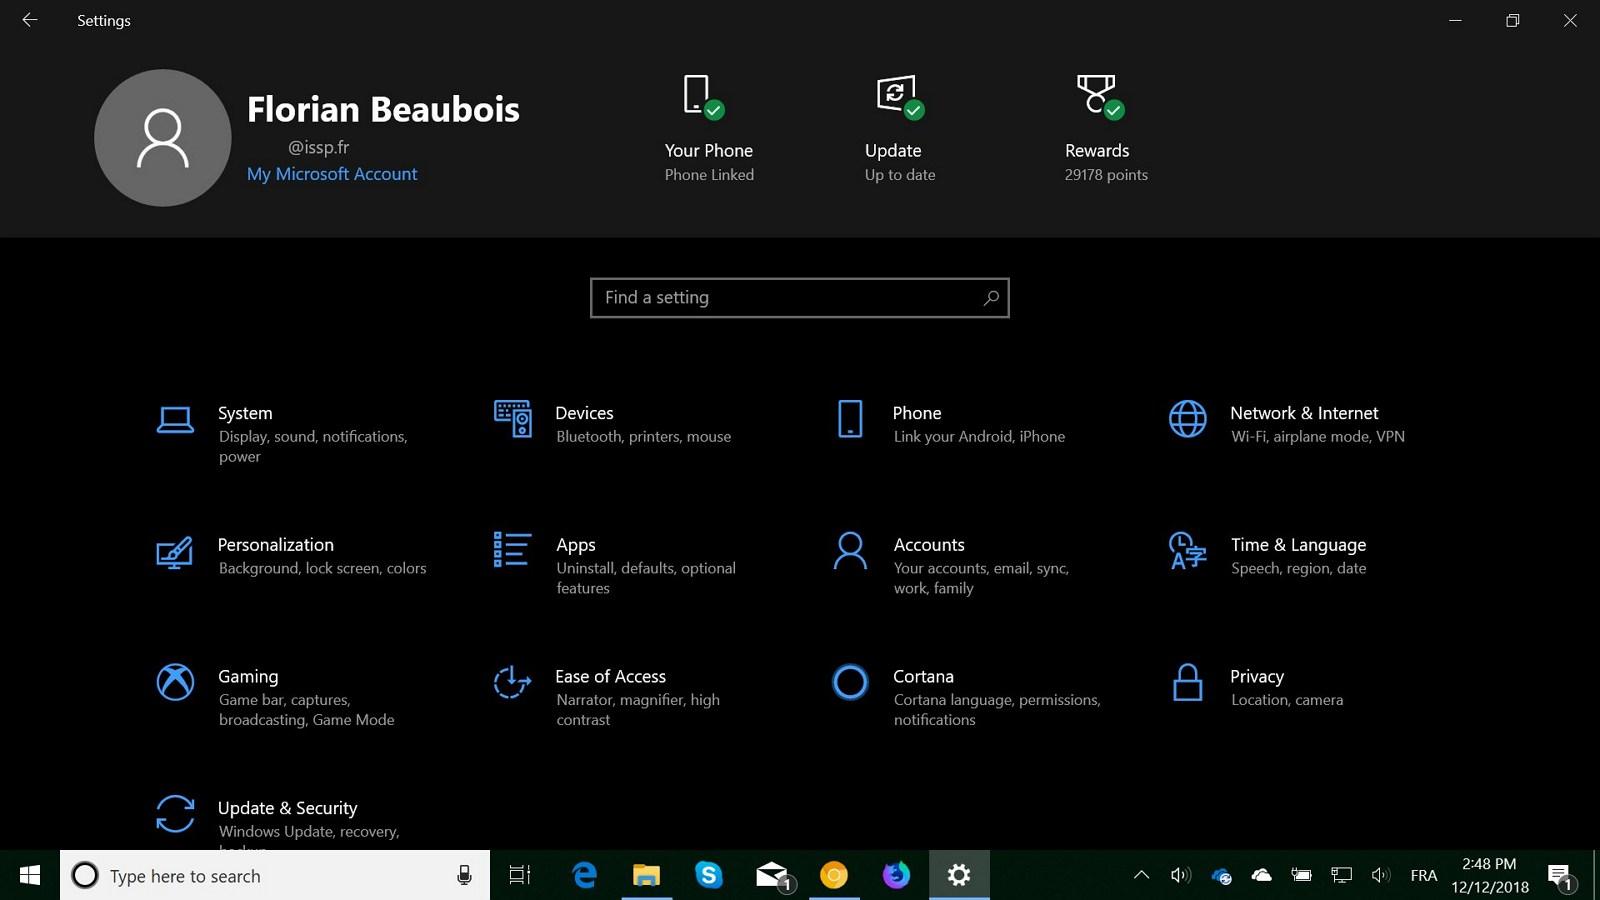 Settings app header design on Windows 10 version 1903